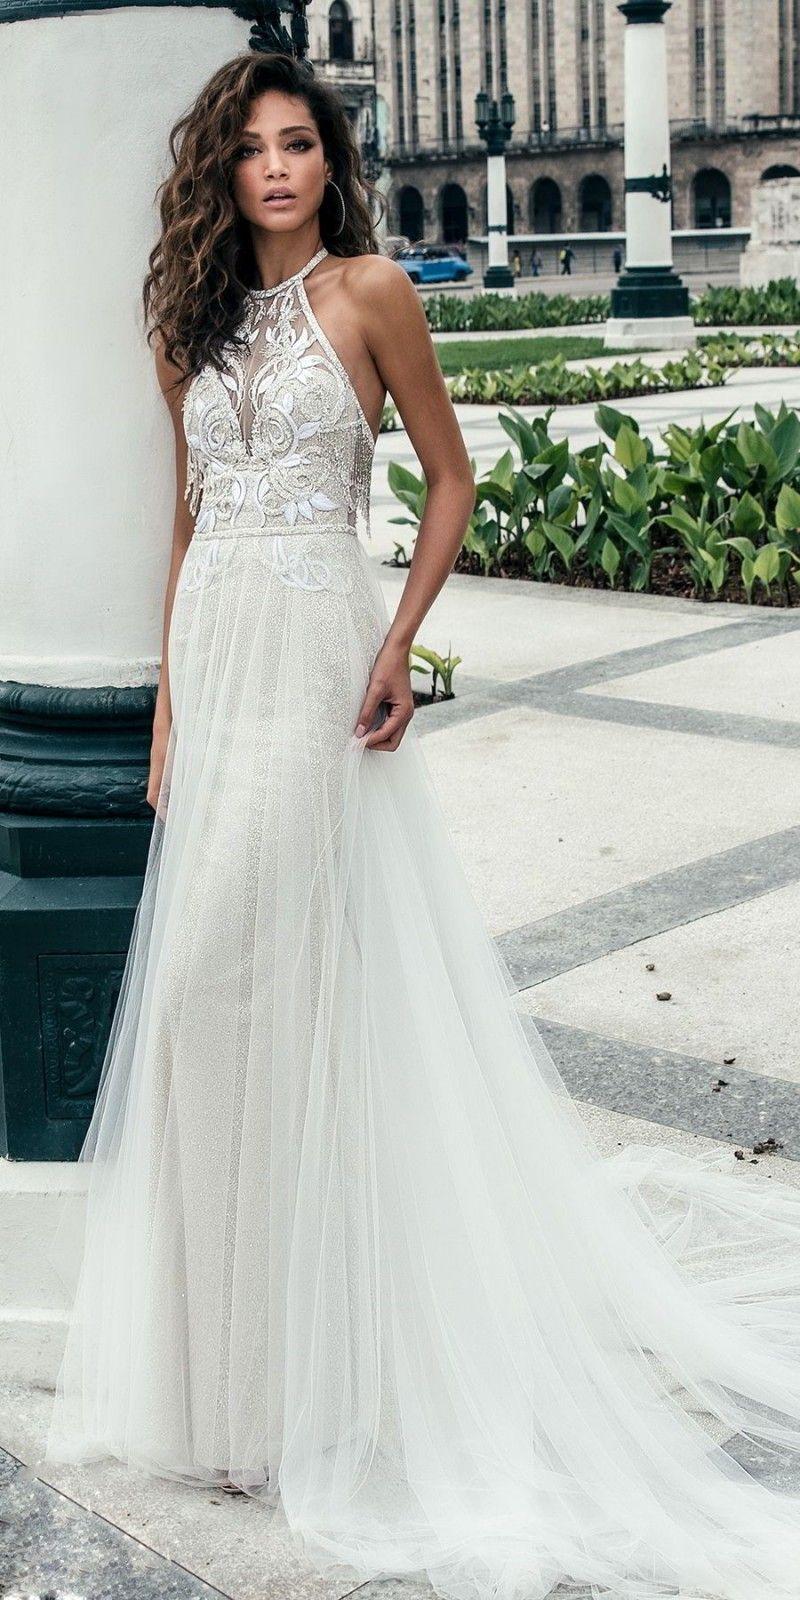 Julie Vino Beach Wedding Dresses Backless Halter Neck Illusion Lace Applique Boho Wedding Gowns Sweep Train Tulle Bridal Dress